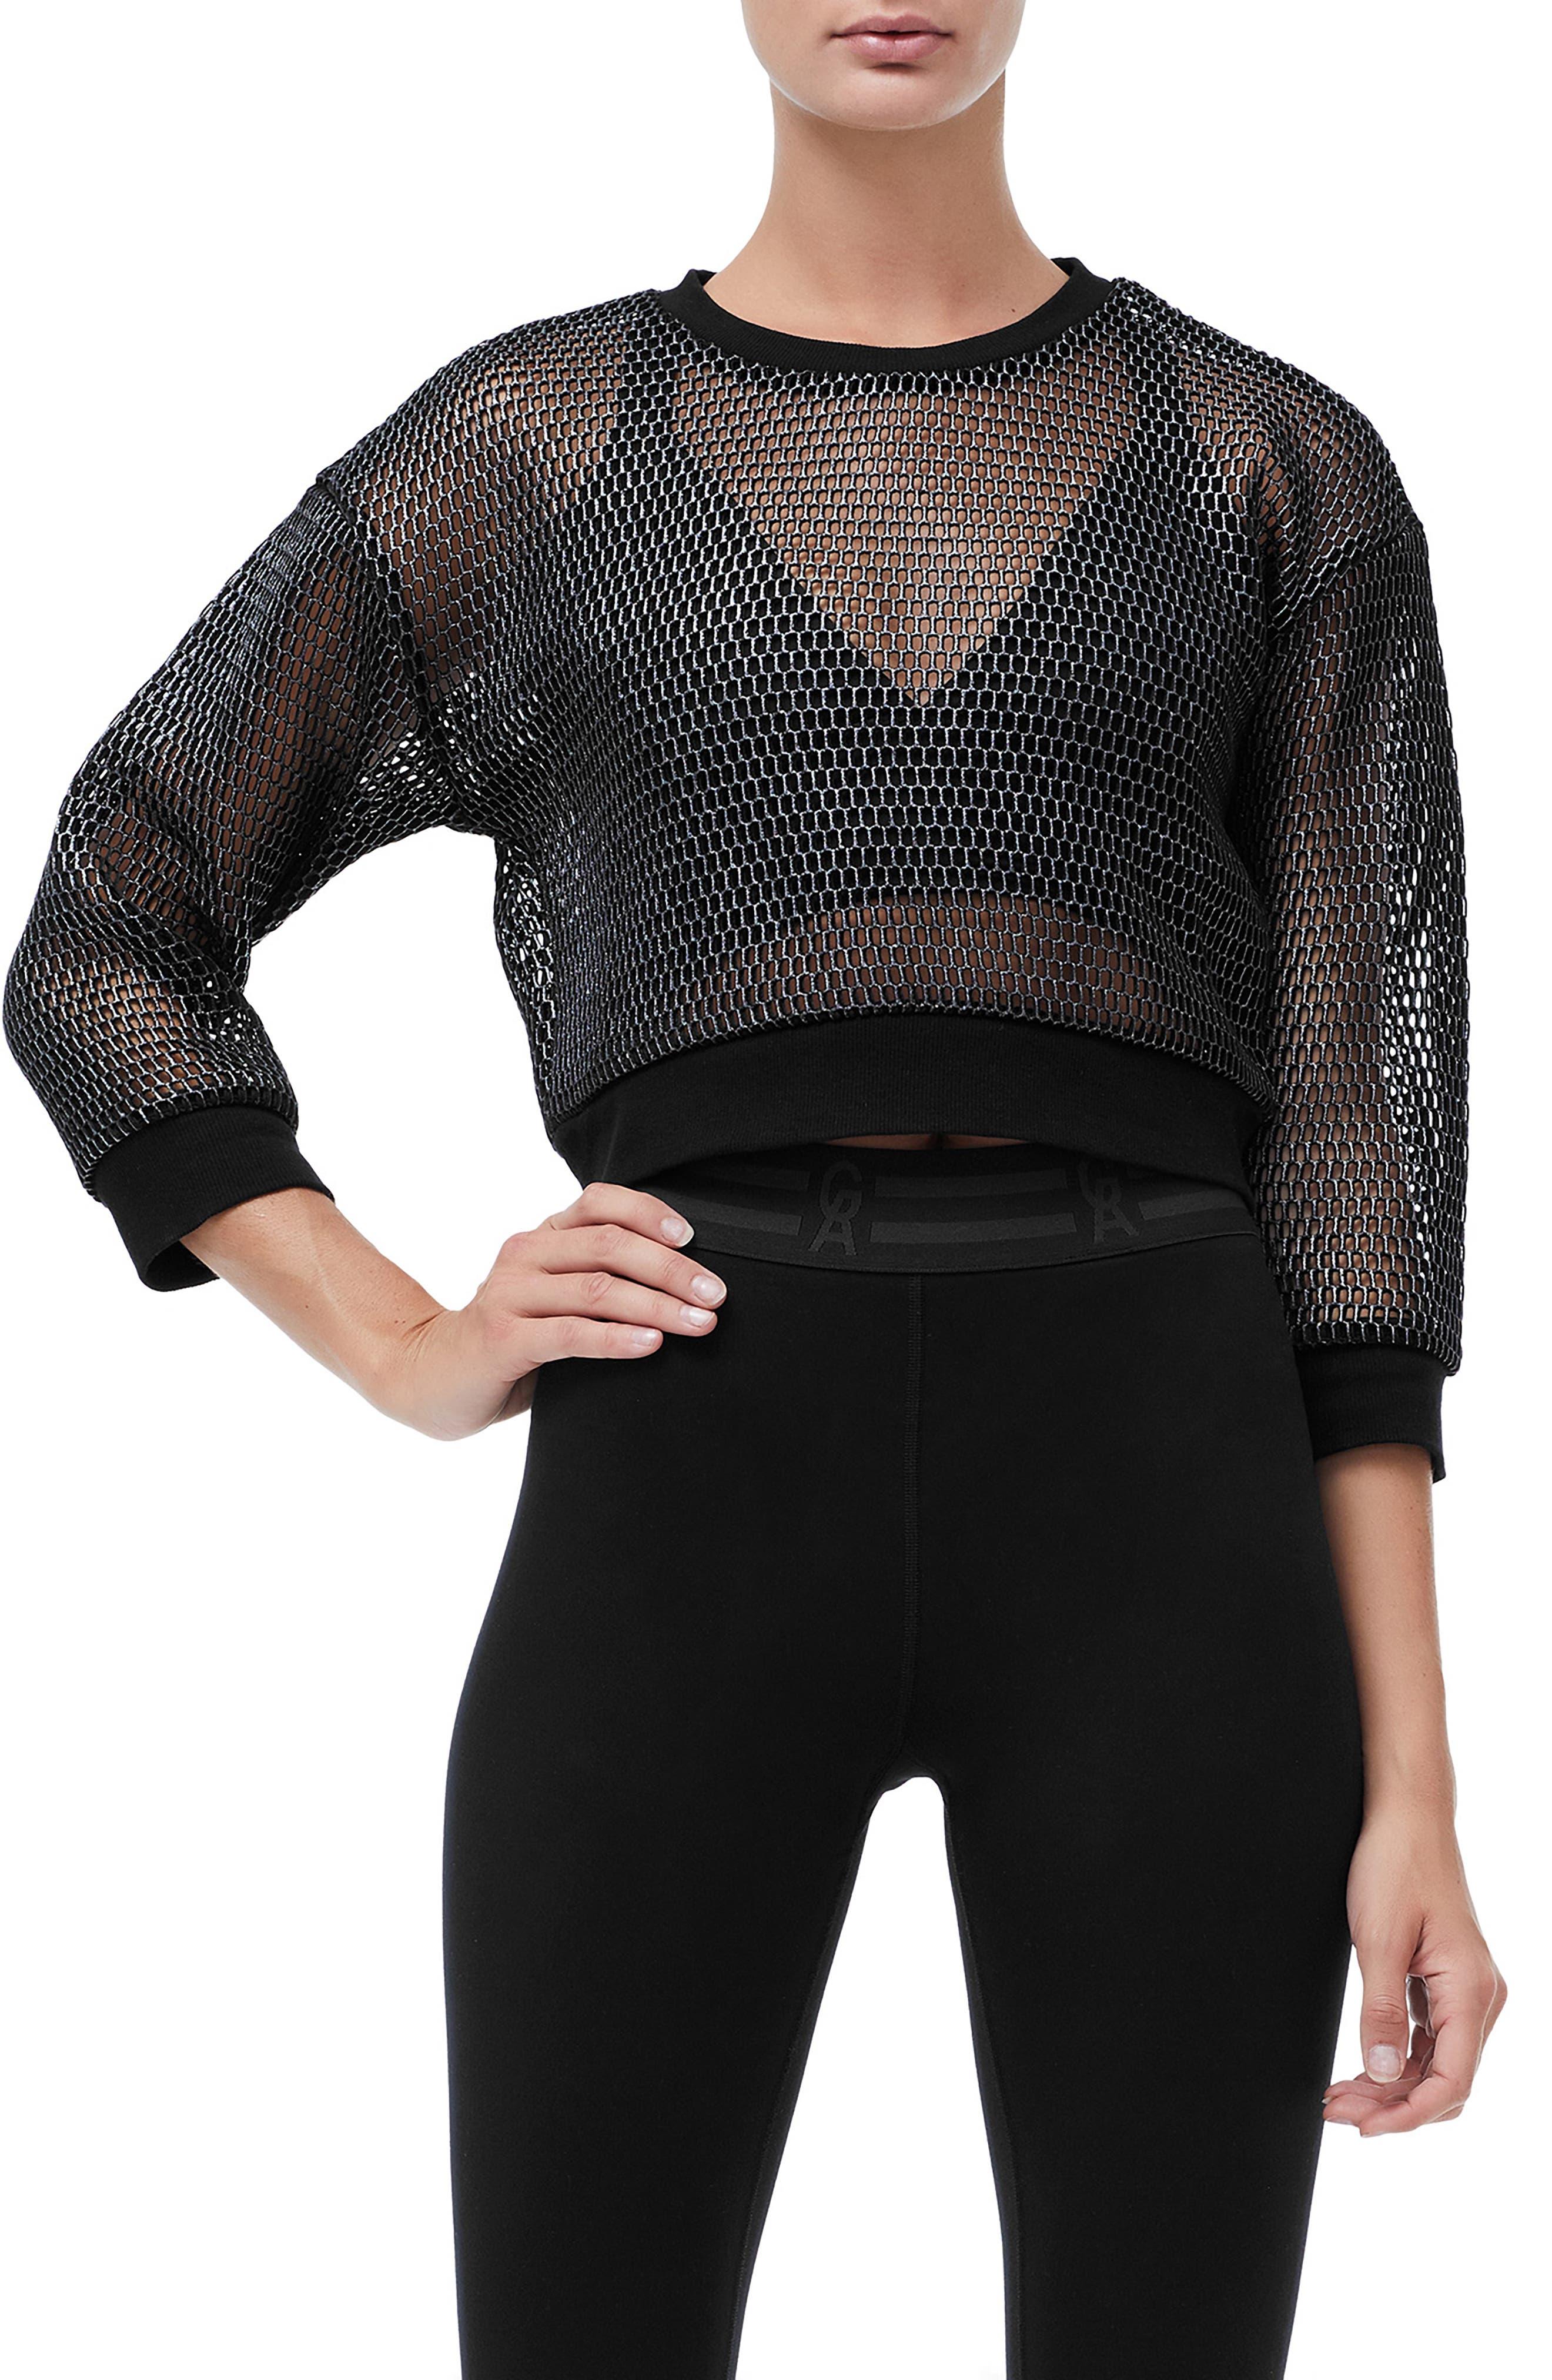 Branded Mesh Pullover Sweatshirt,                             Main thumbnail 1, color,                             SILVER001